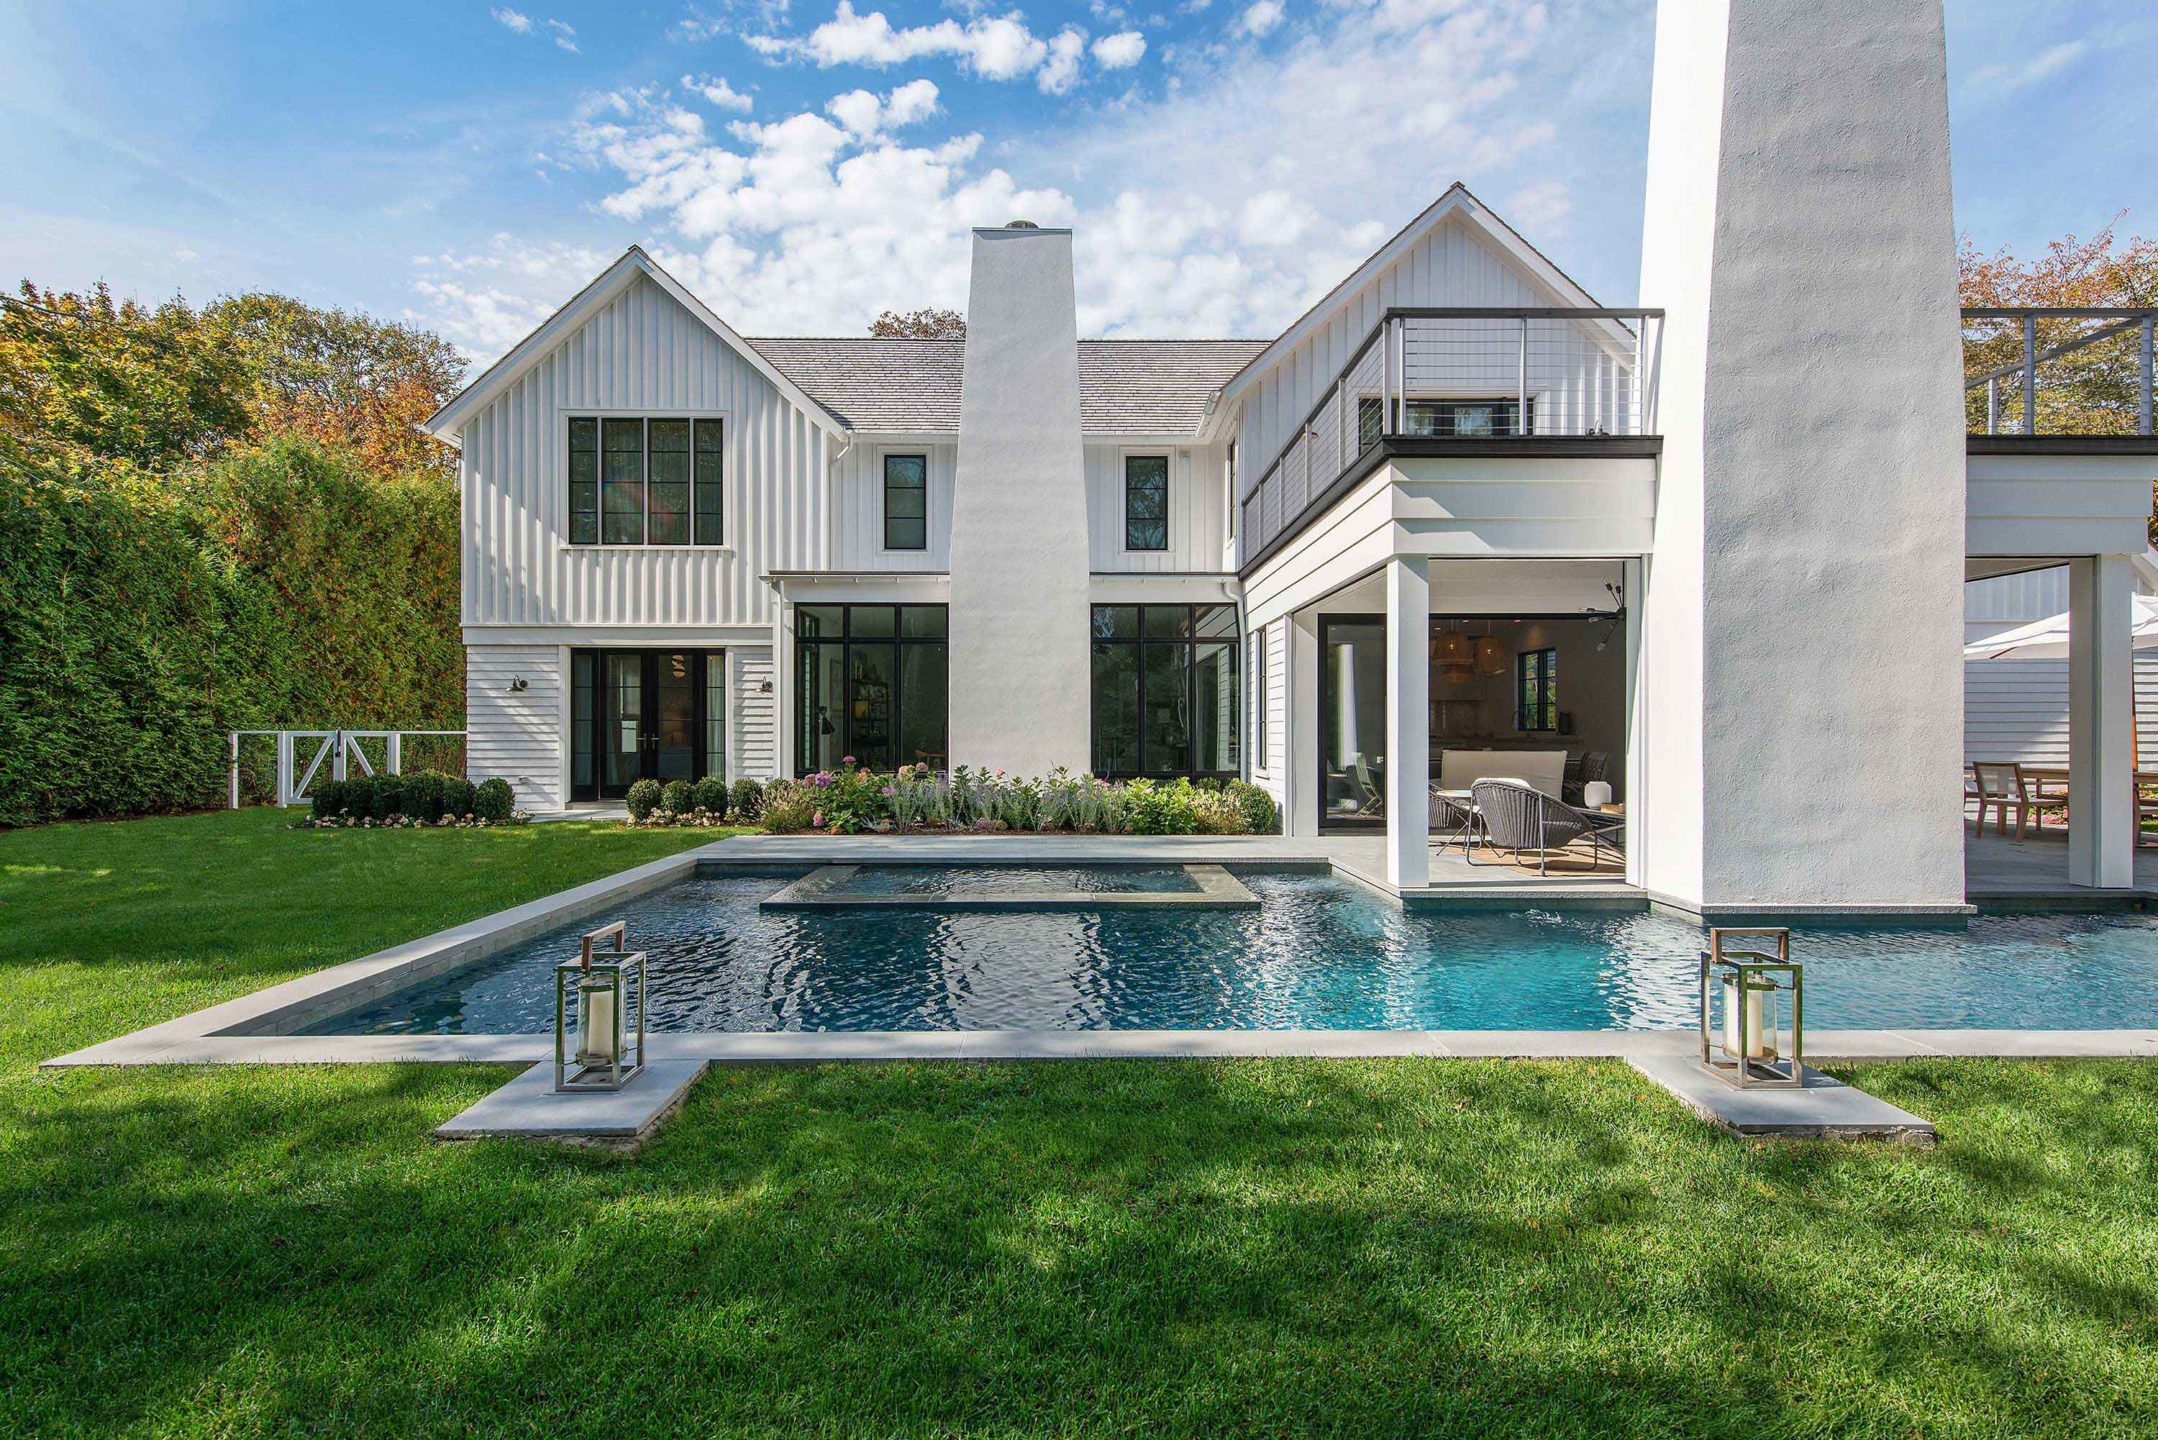 Nicole-Fuller-Interior-Designer-east-hampton-modern-bohemian-beach-house-2